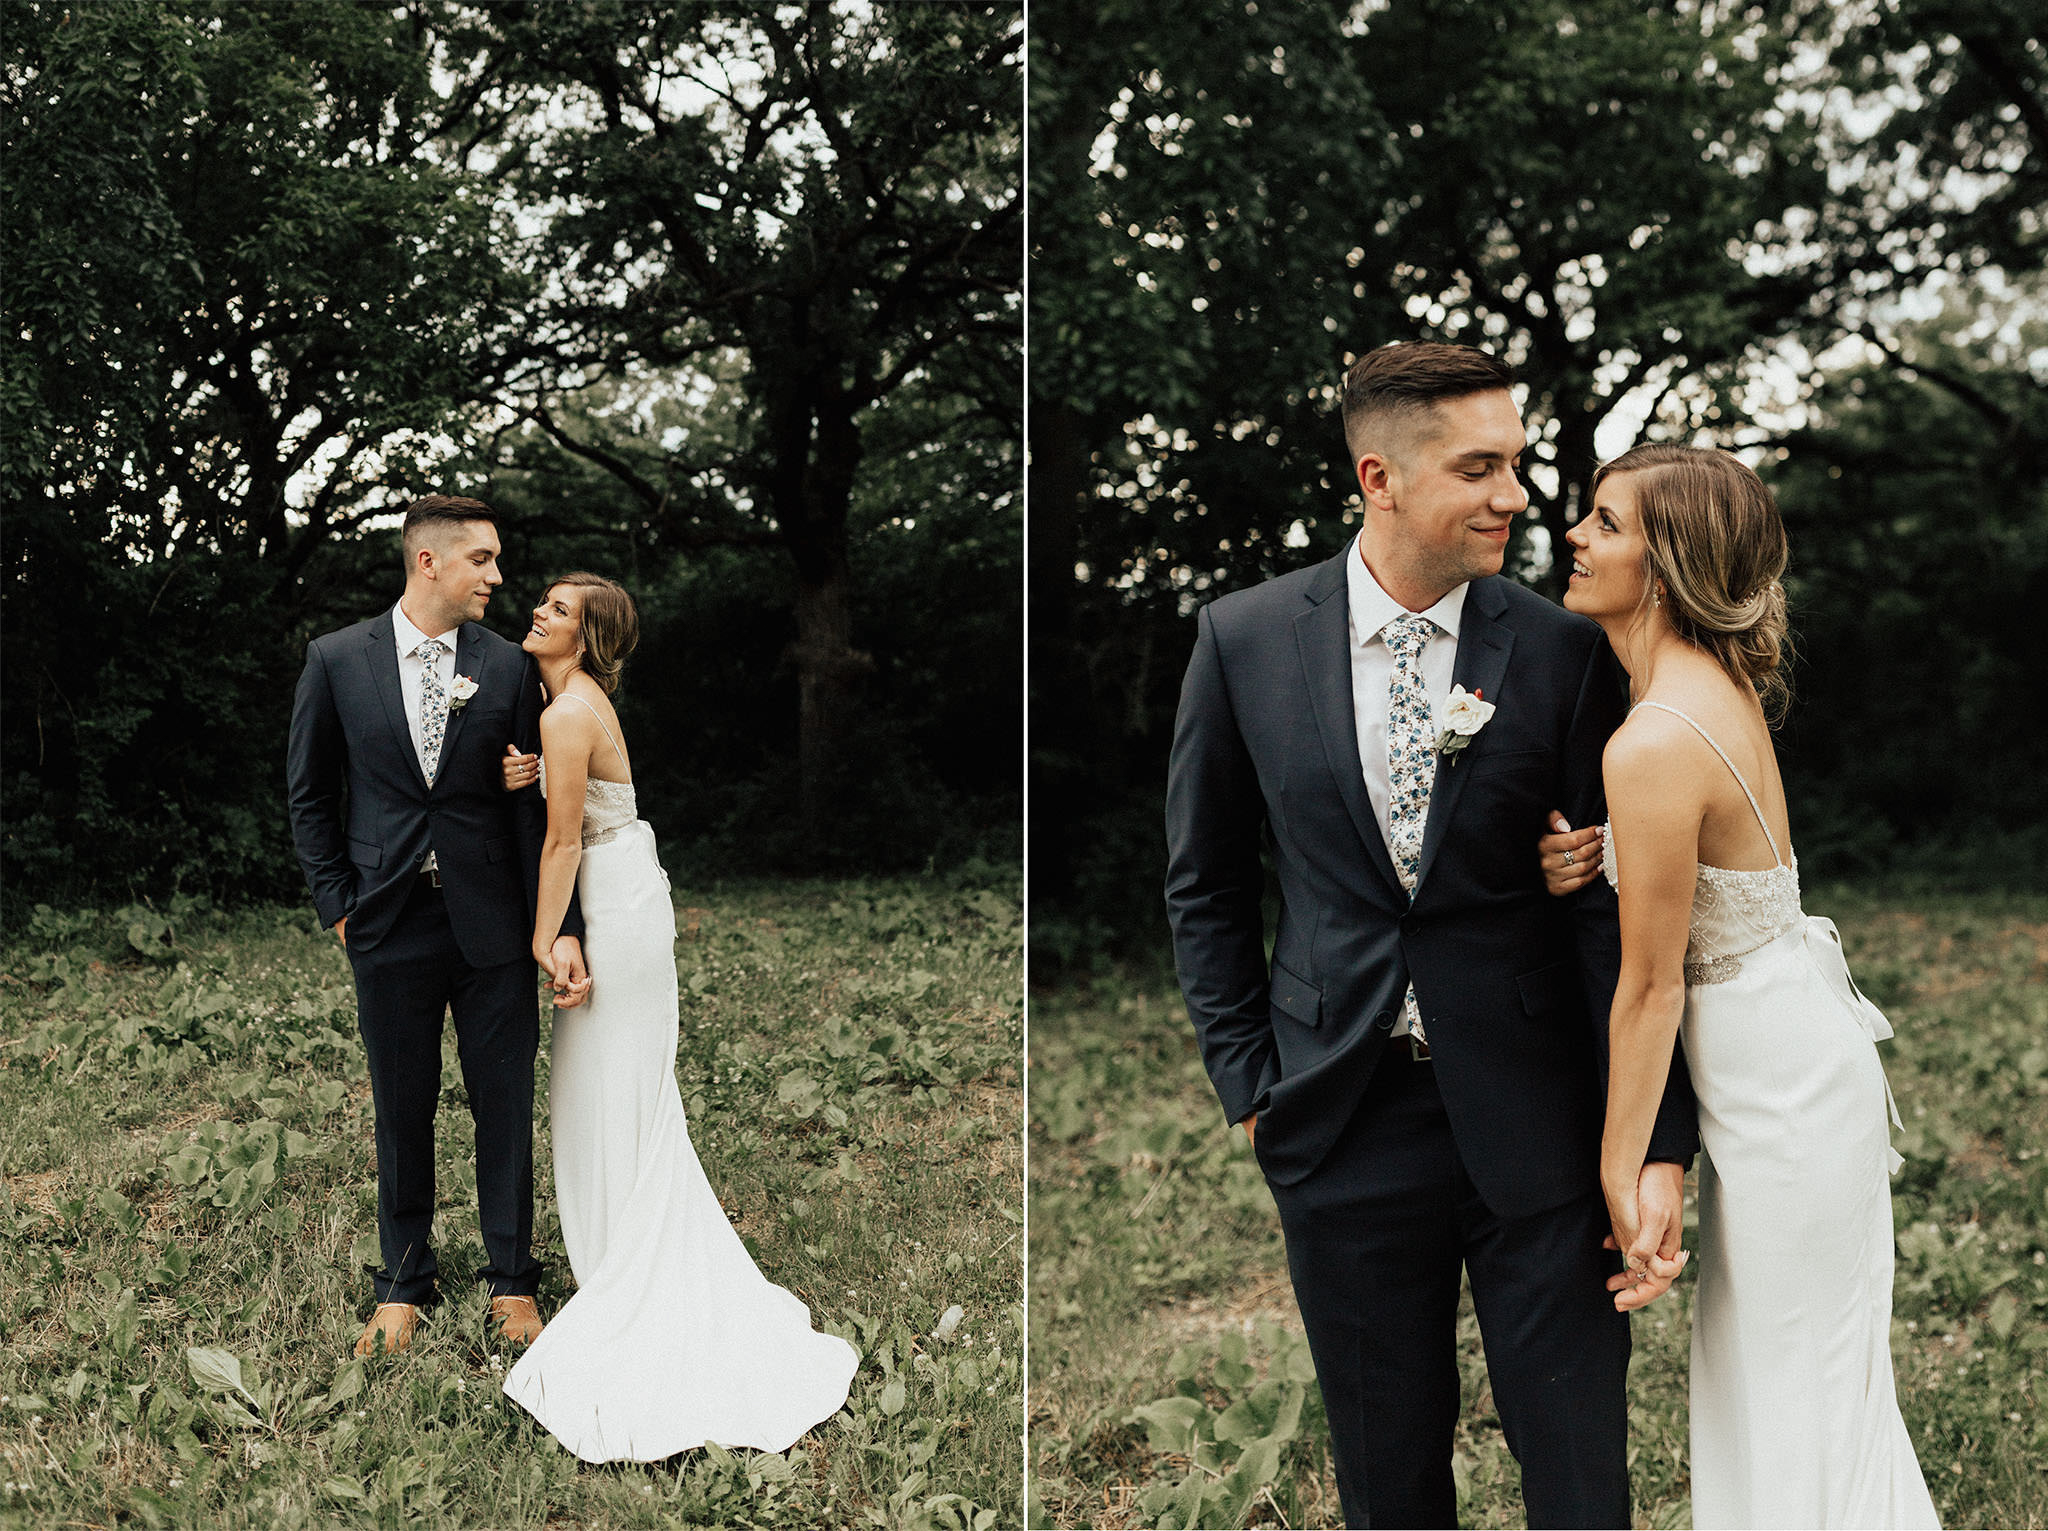 Arizona-Adventure-Elopement-Wedding-Photographer-91.jpg